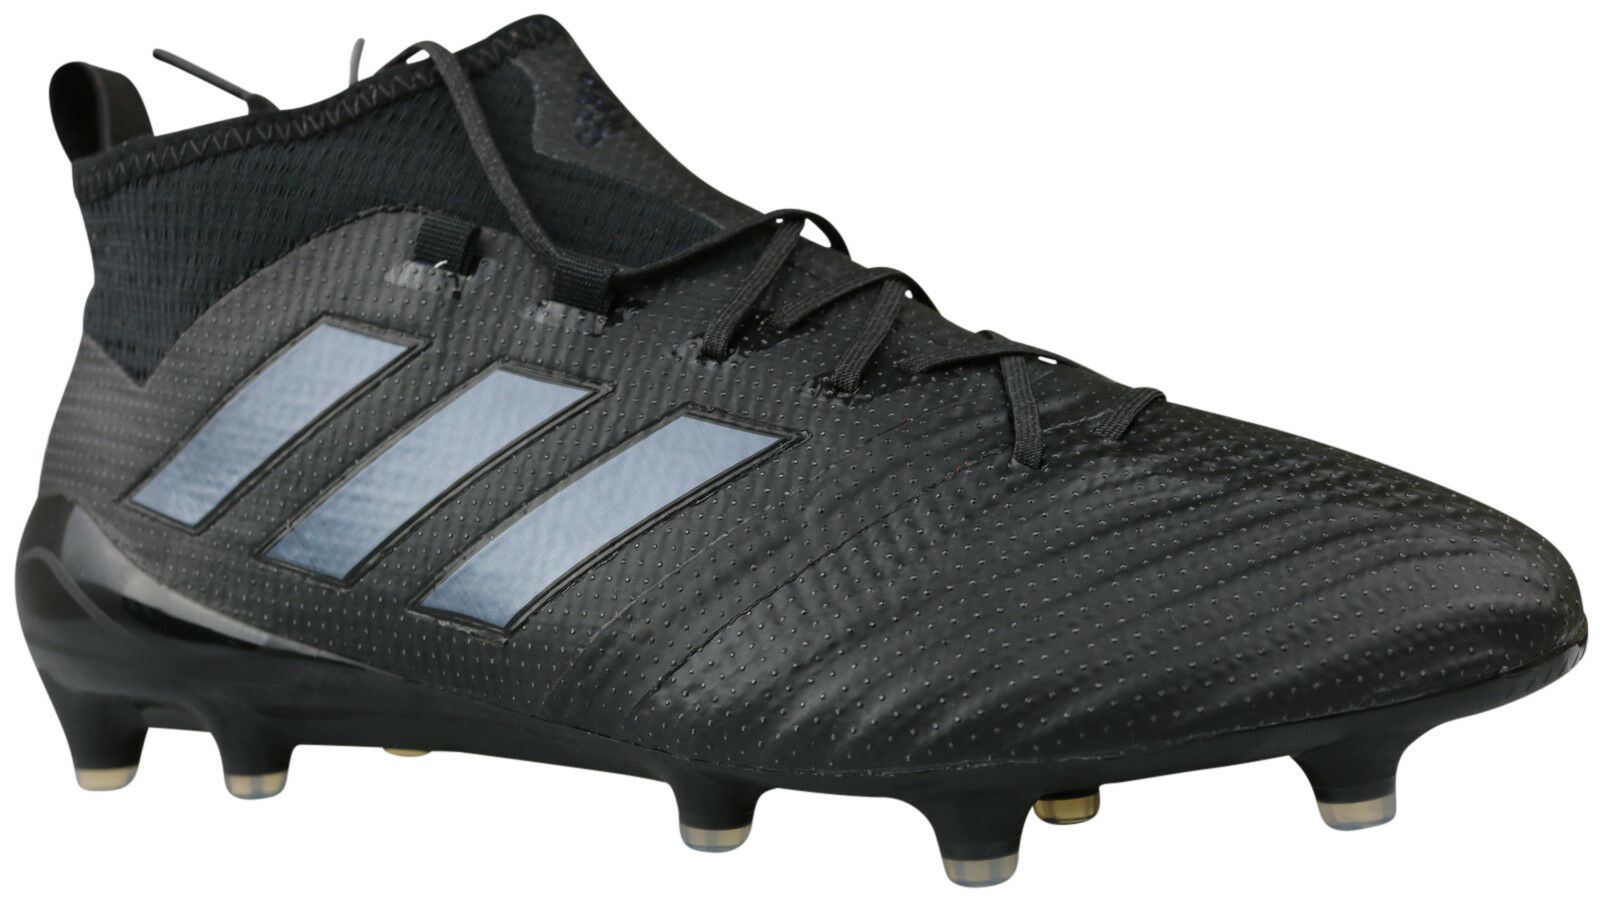 ADIDAS ACE 17.1 Primeknit FG scarpe calcio camme nero s77037 MIS. 39  46 NUOVO